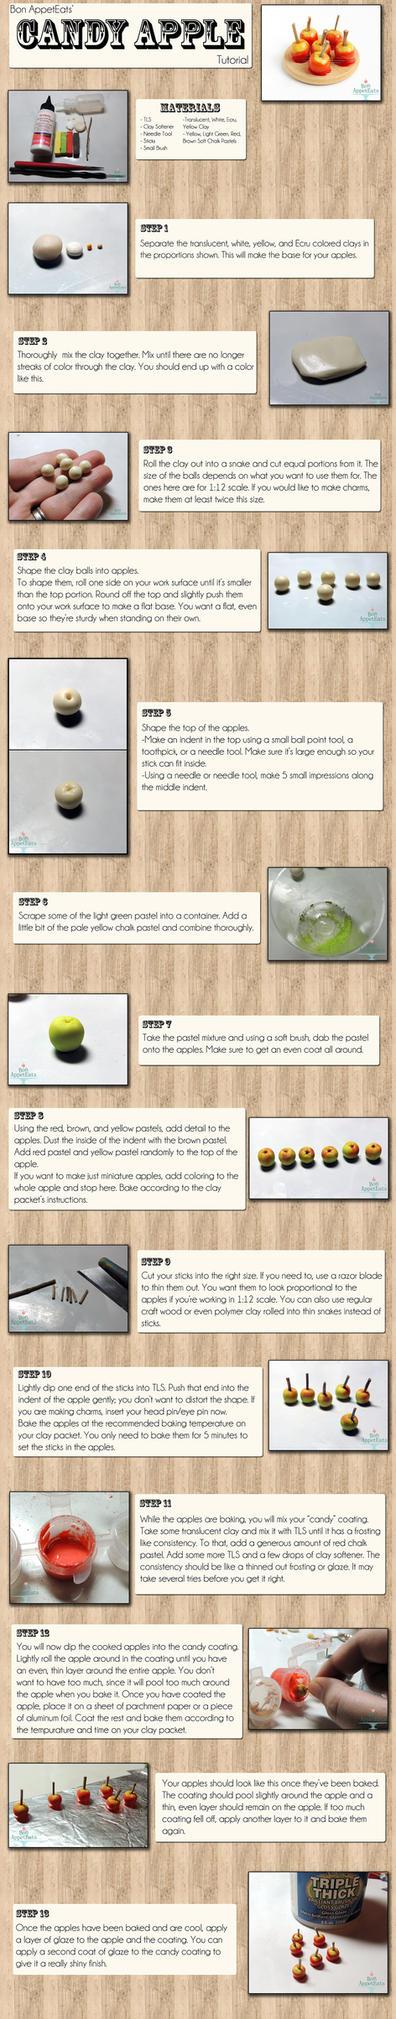 Tutorial: Miniature Candy Apples by Bon-AppetEats